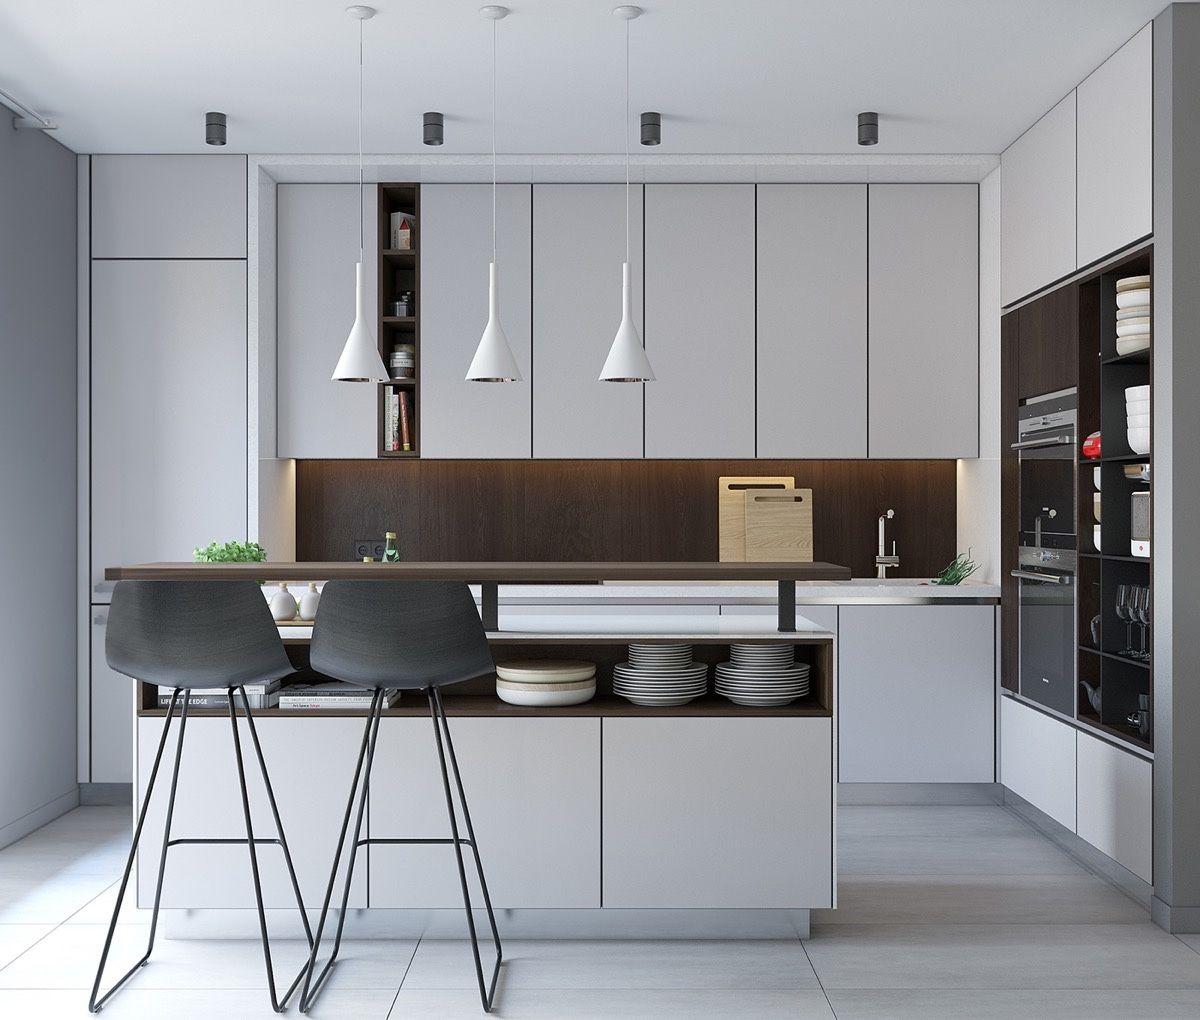 Best Kitchen Gallery: 50 Modern Kitchen Designs That Use Unconventional Geometry Modern of Interior Design For Kitchens  on rachelxblog.com